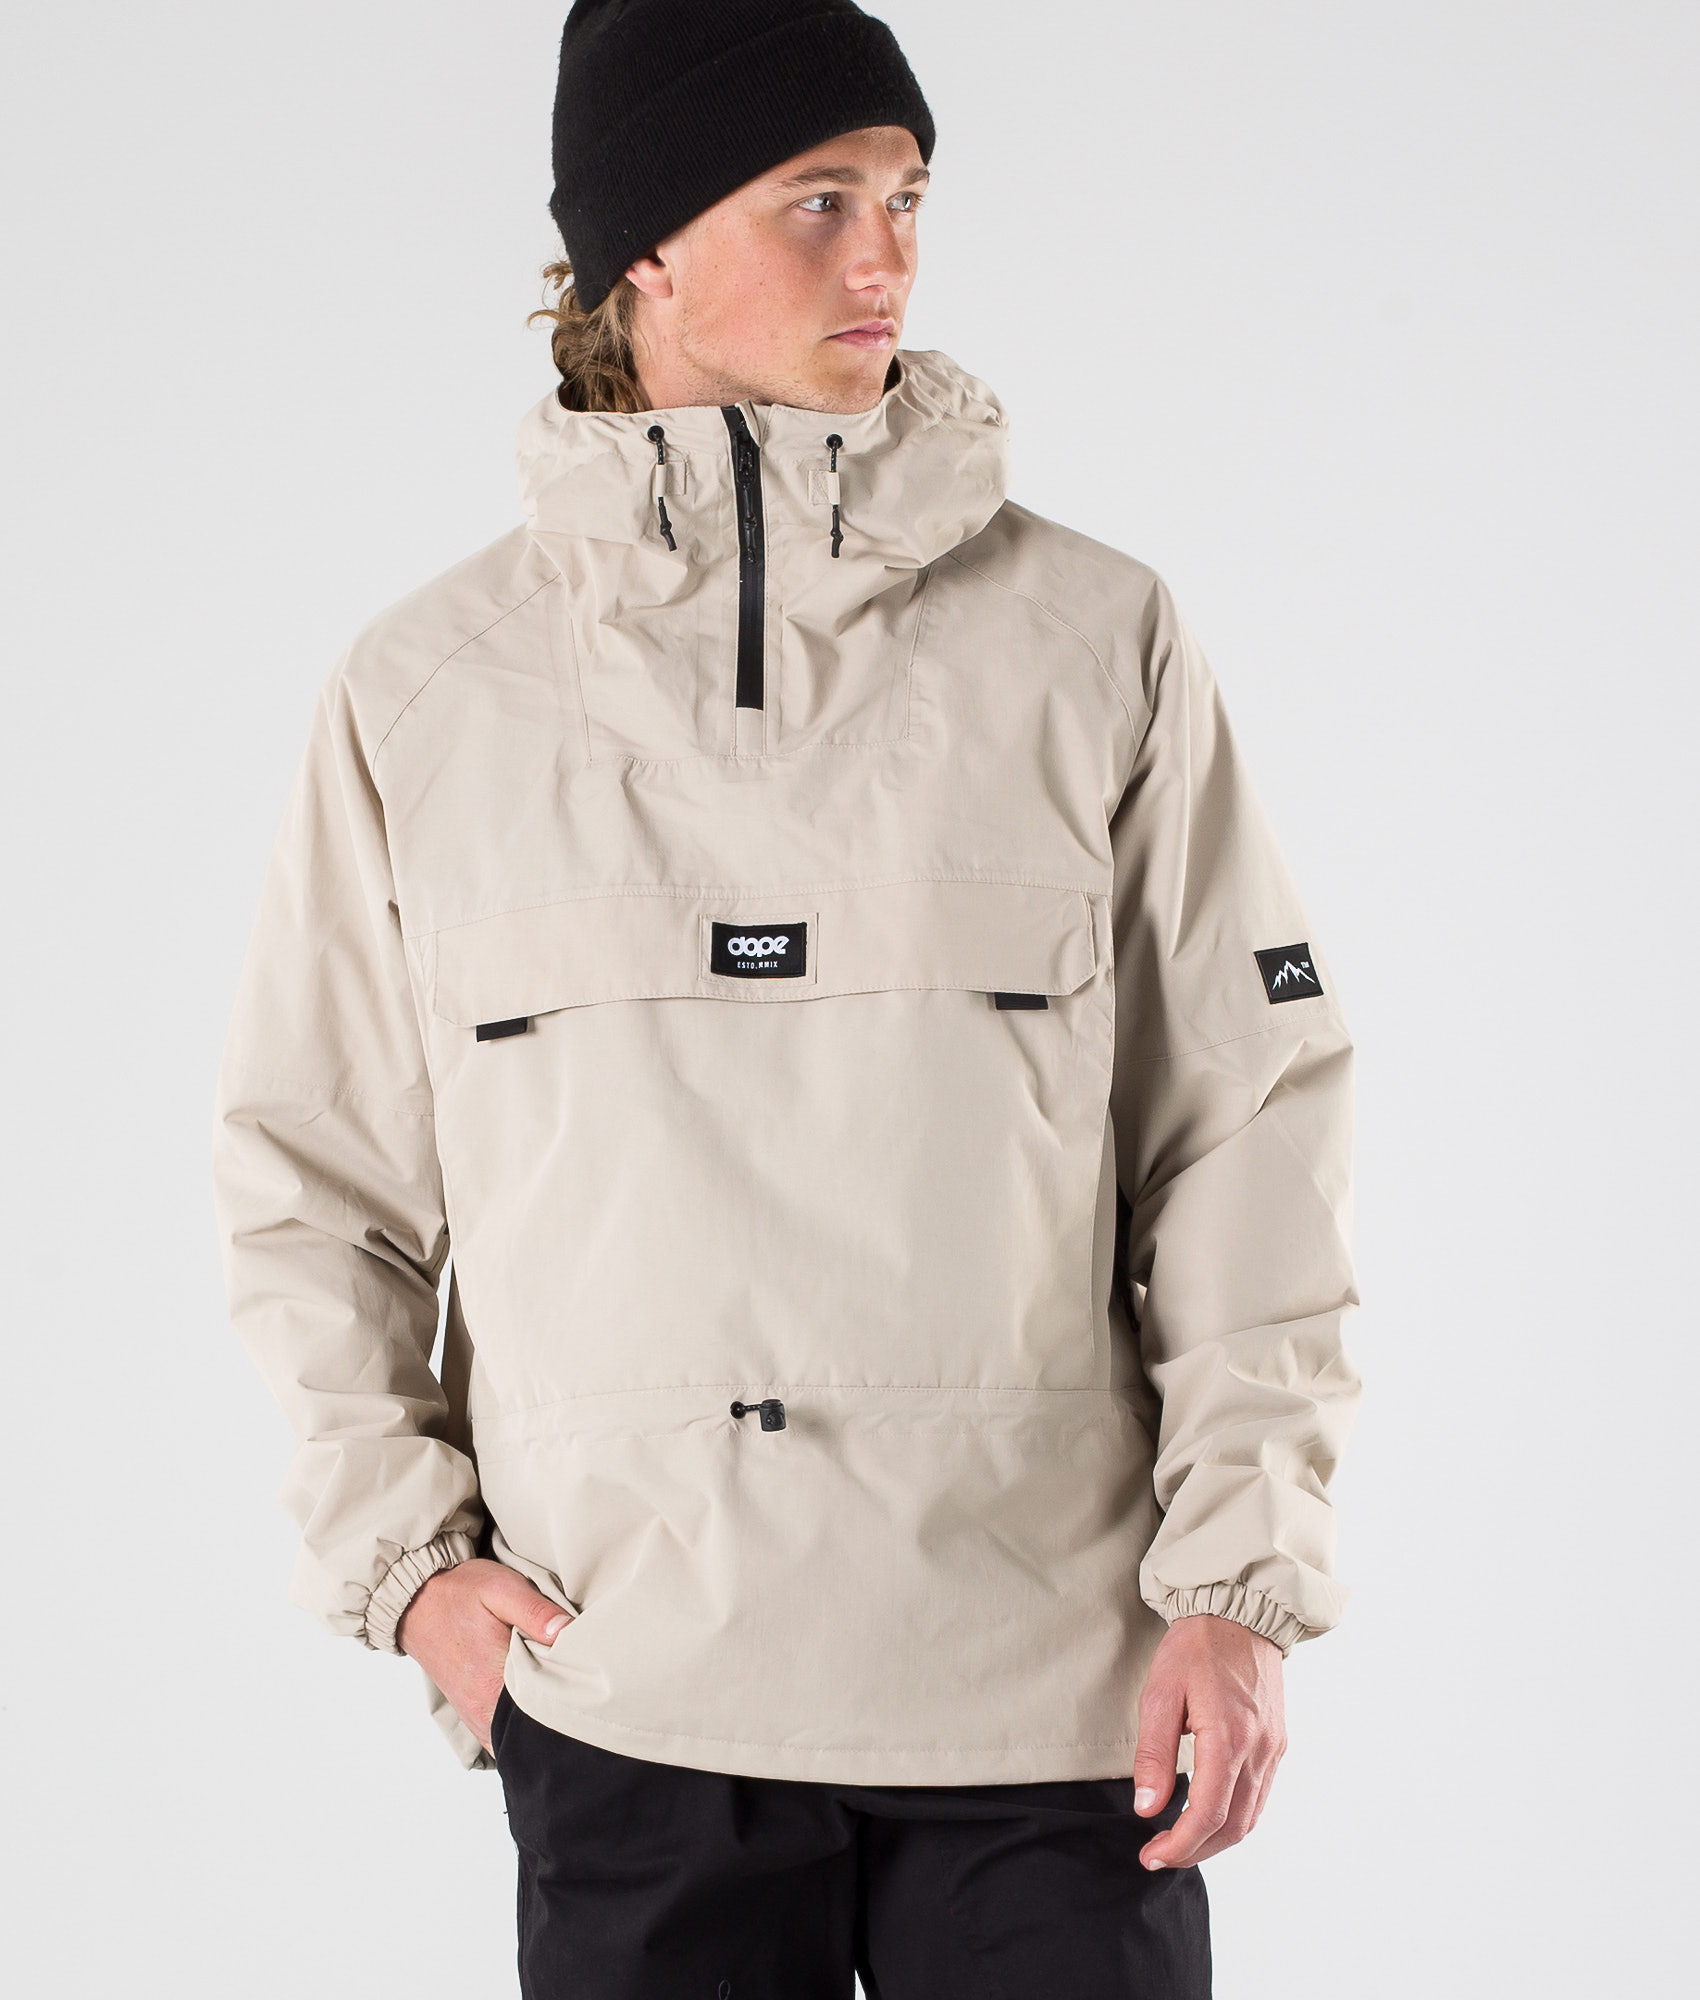 c602187facd69 Men's Streetwear Jackets | Free Delivery | RIDESTORE